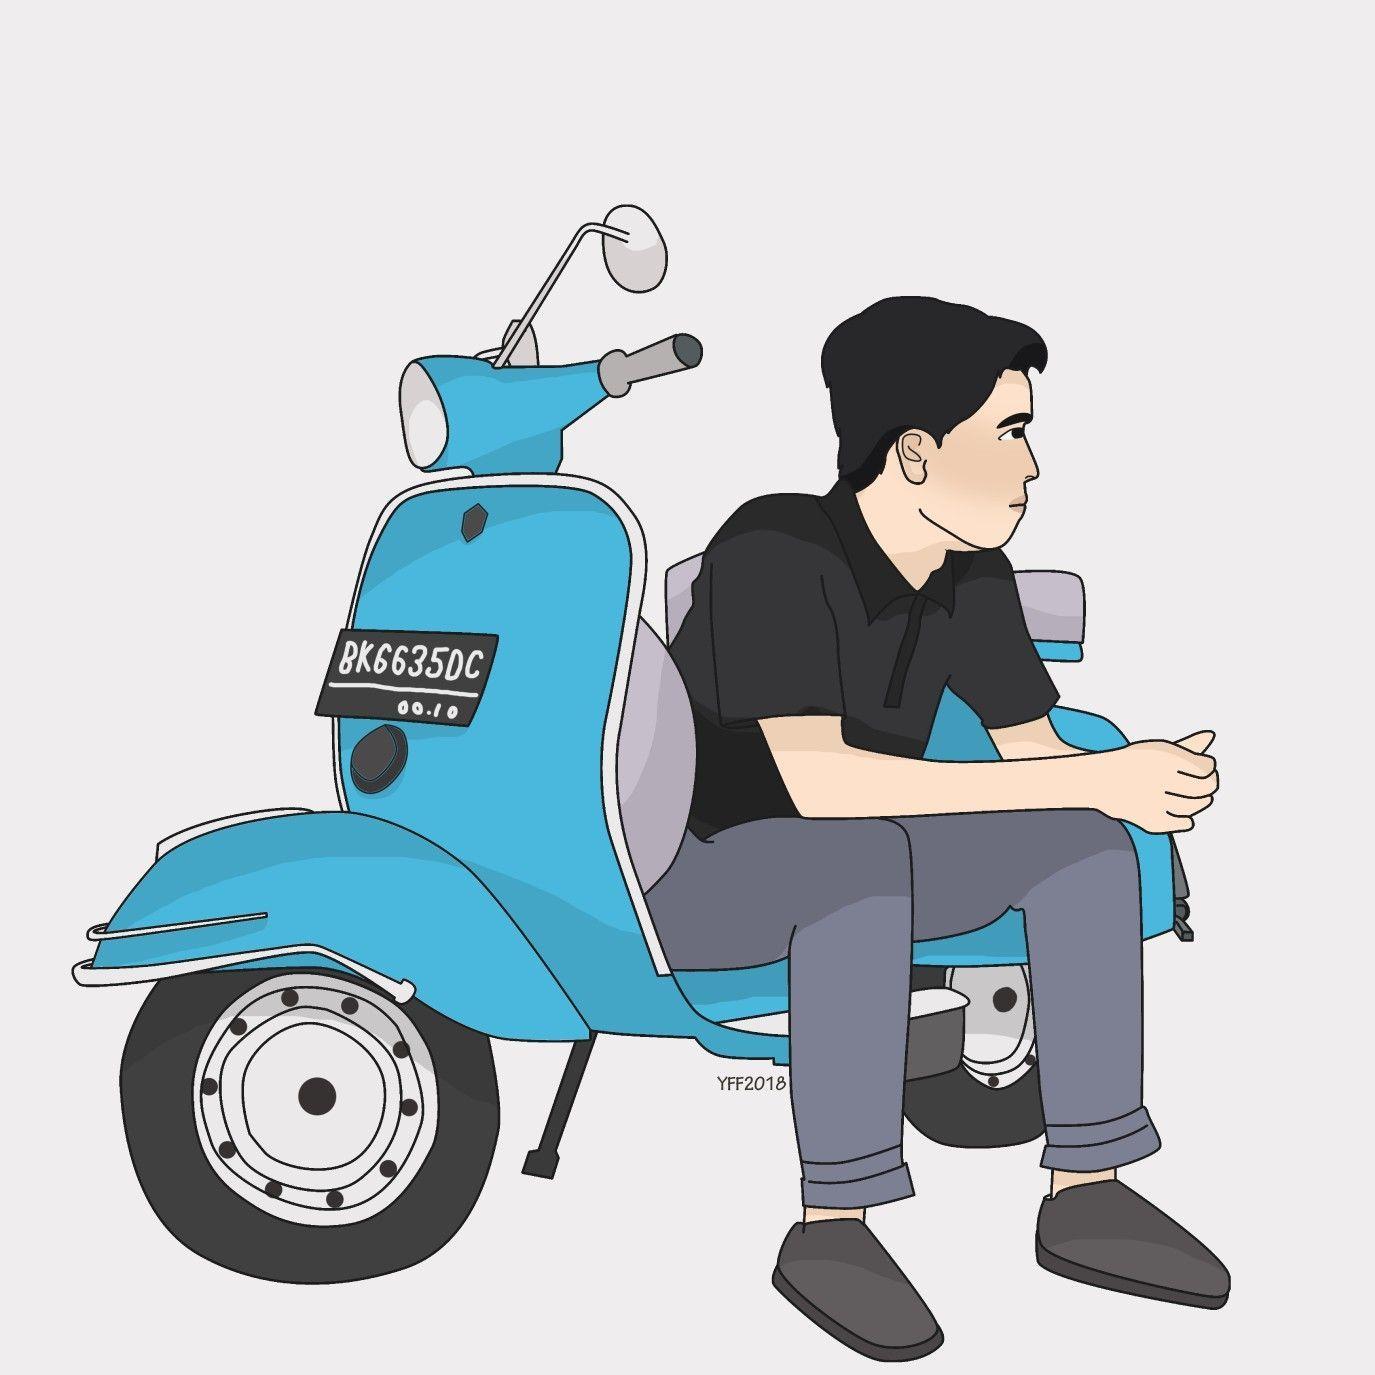 Gambar Motor Vespa Karikatur Rosaemente Com Ilustrasi Karakter Gambar Kartun Seni Kartun